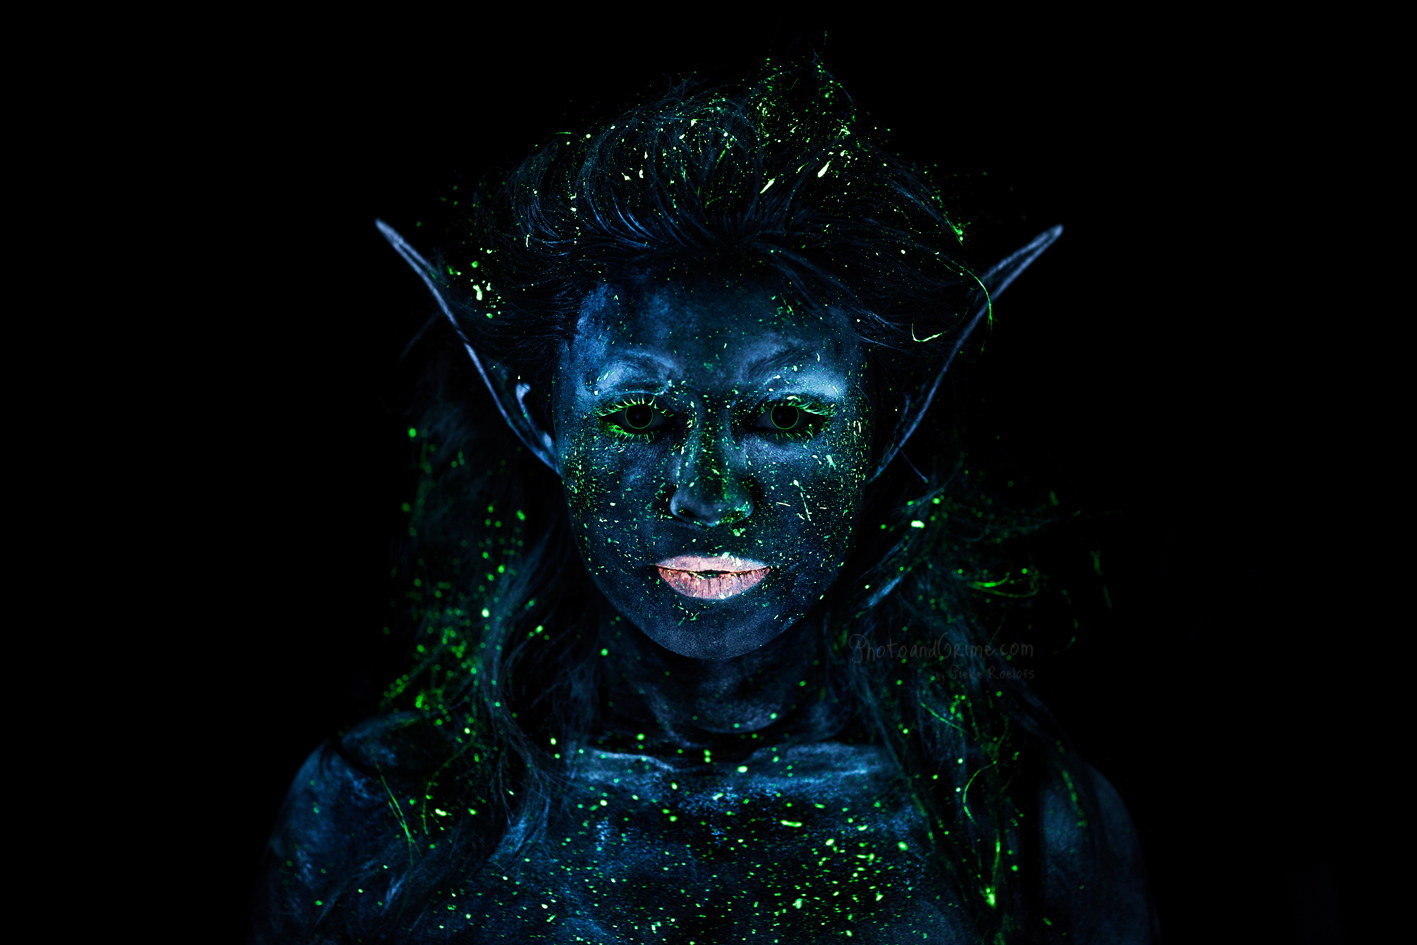 UV blacklight Fairy (2014). (Make-up artist Marthe Neus)